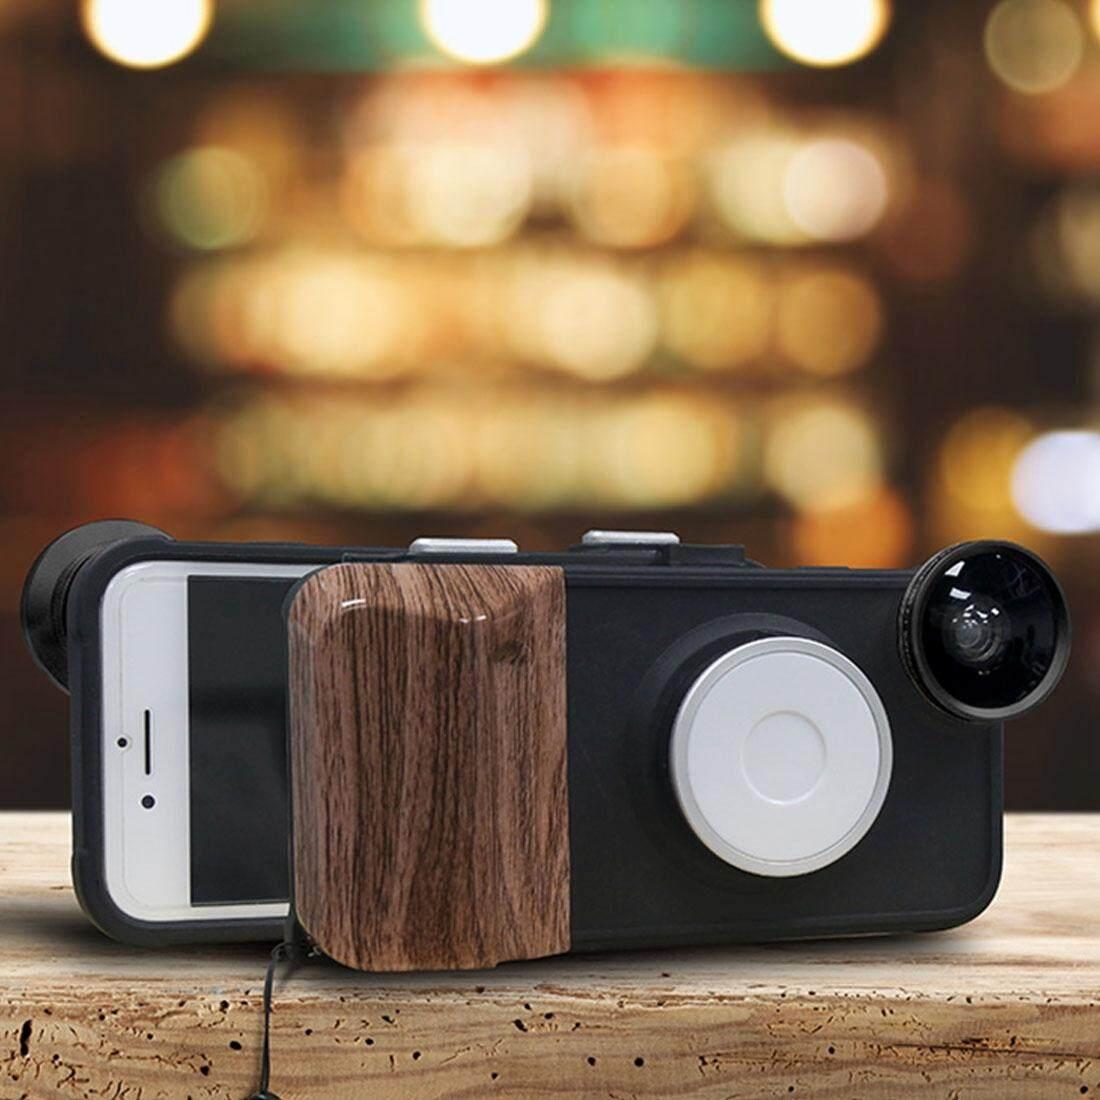 Hình ảnh RK23 for iPhone 8 & 7 Selfie 9 Levels of Brightness Beauty Fill Light Phone Case, With Wide Angle + Macro + Fisheye Lens(Black) - intl